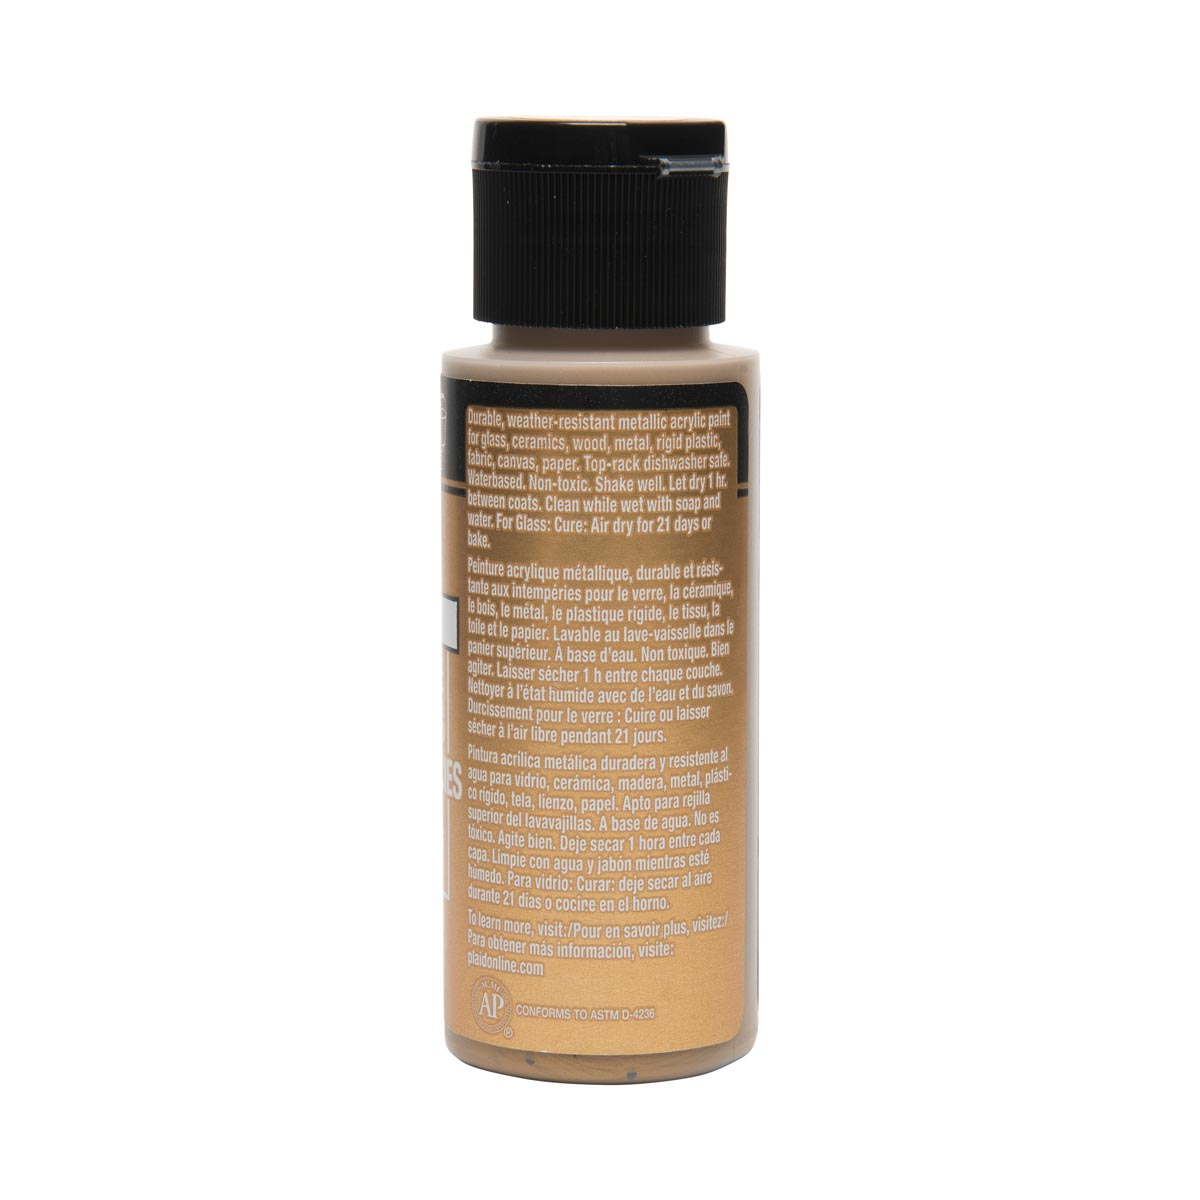 FolkArt ® Multi-Surface Metallic Acrylic Paints - Anitque Gold, 2 oz.